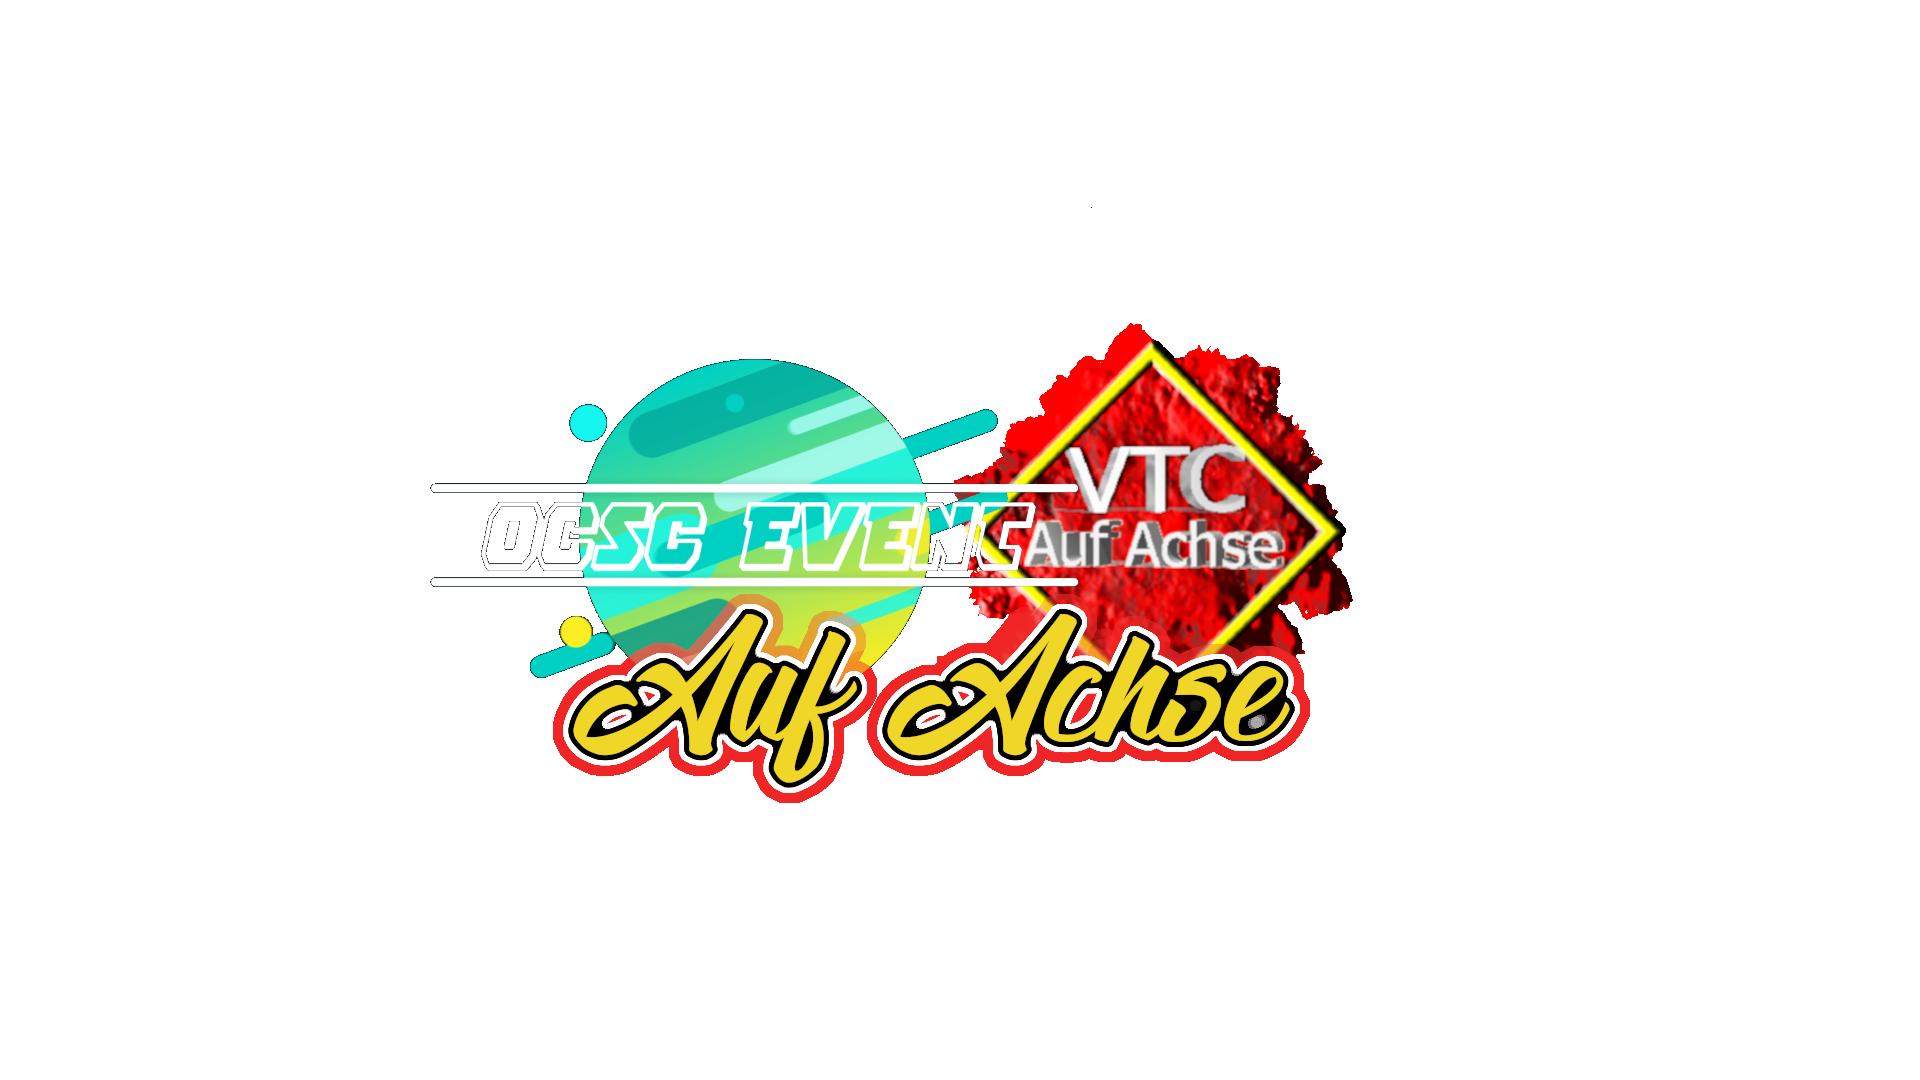 🚚🚛VTC AA | Celebrate VTC`s Year 🚚🚛